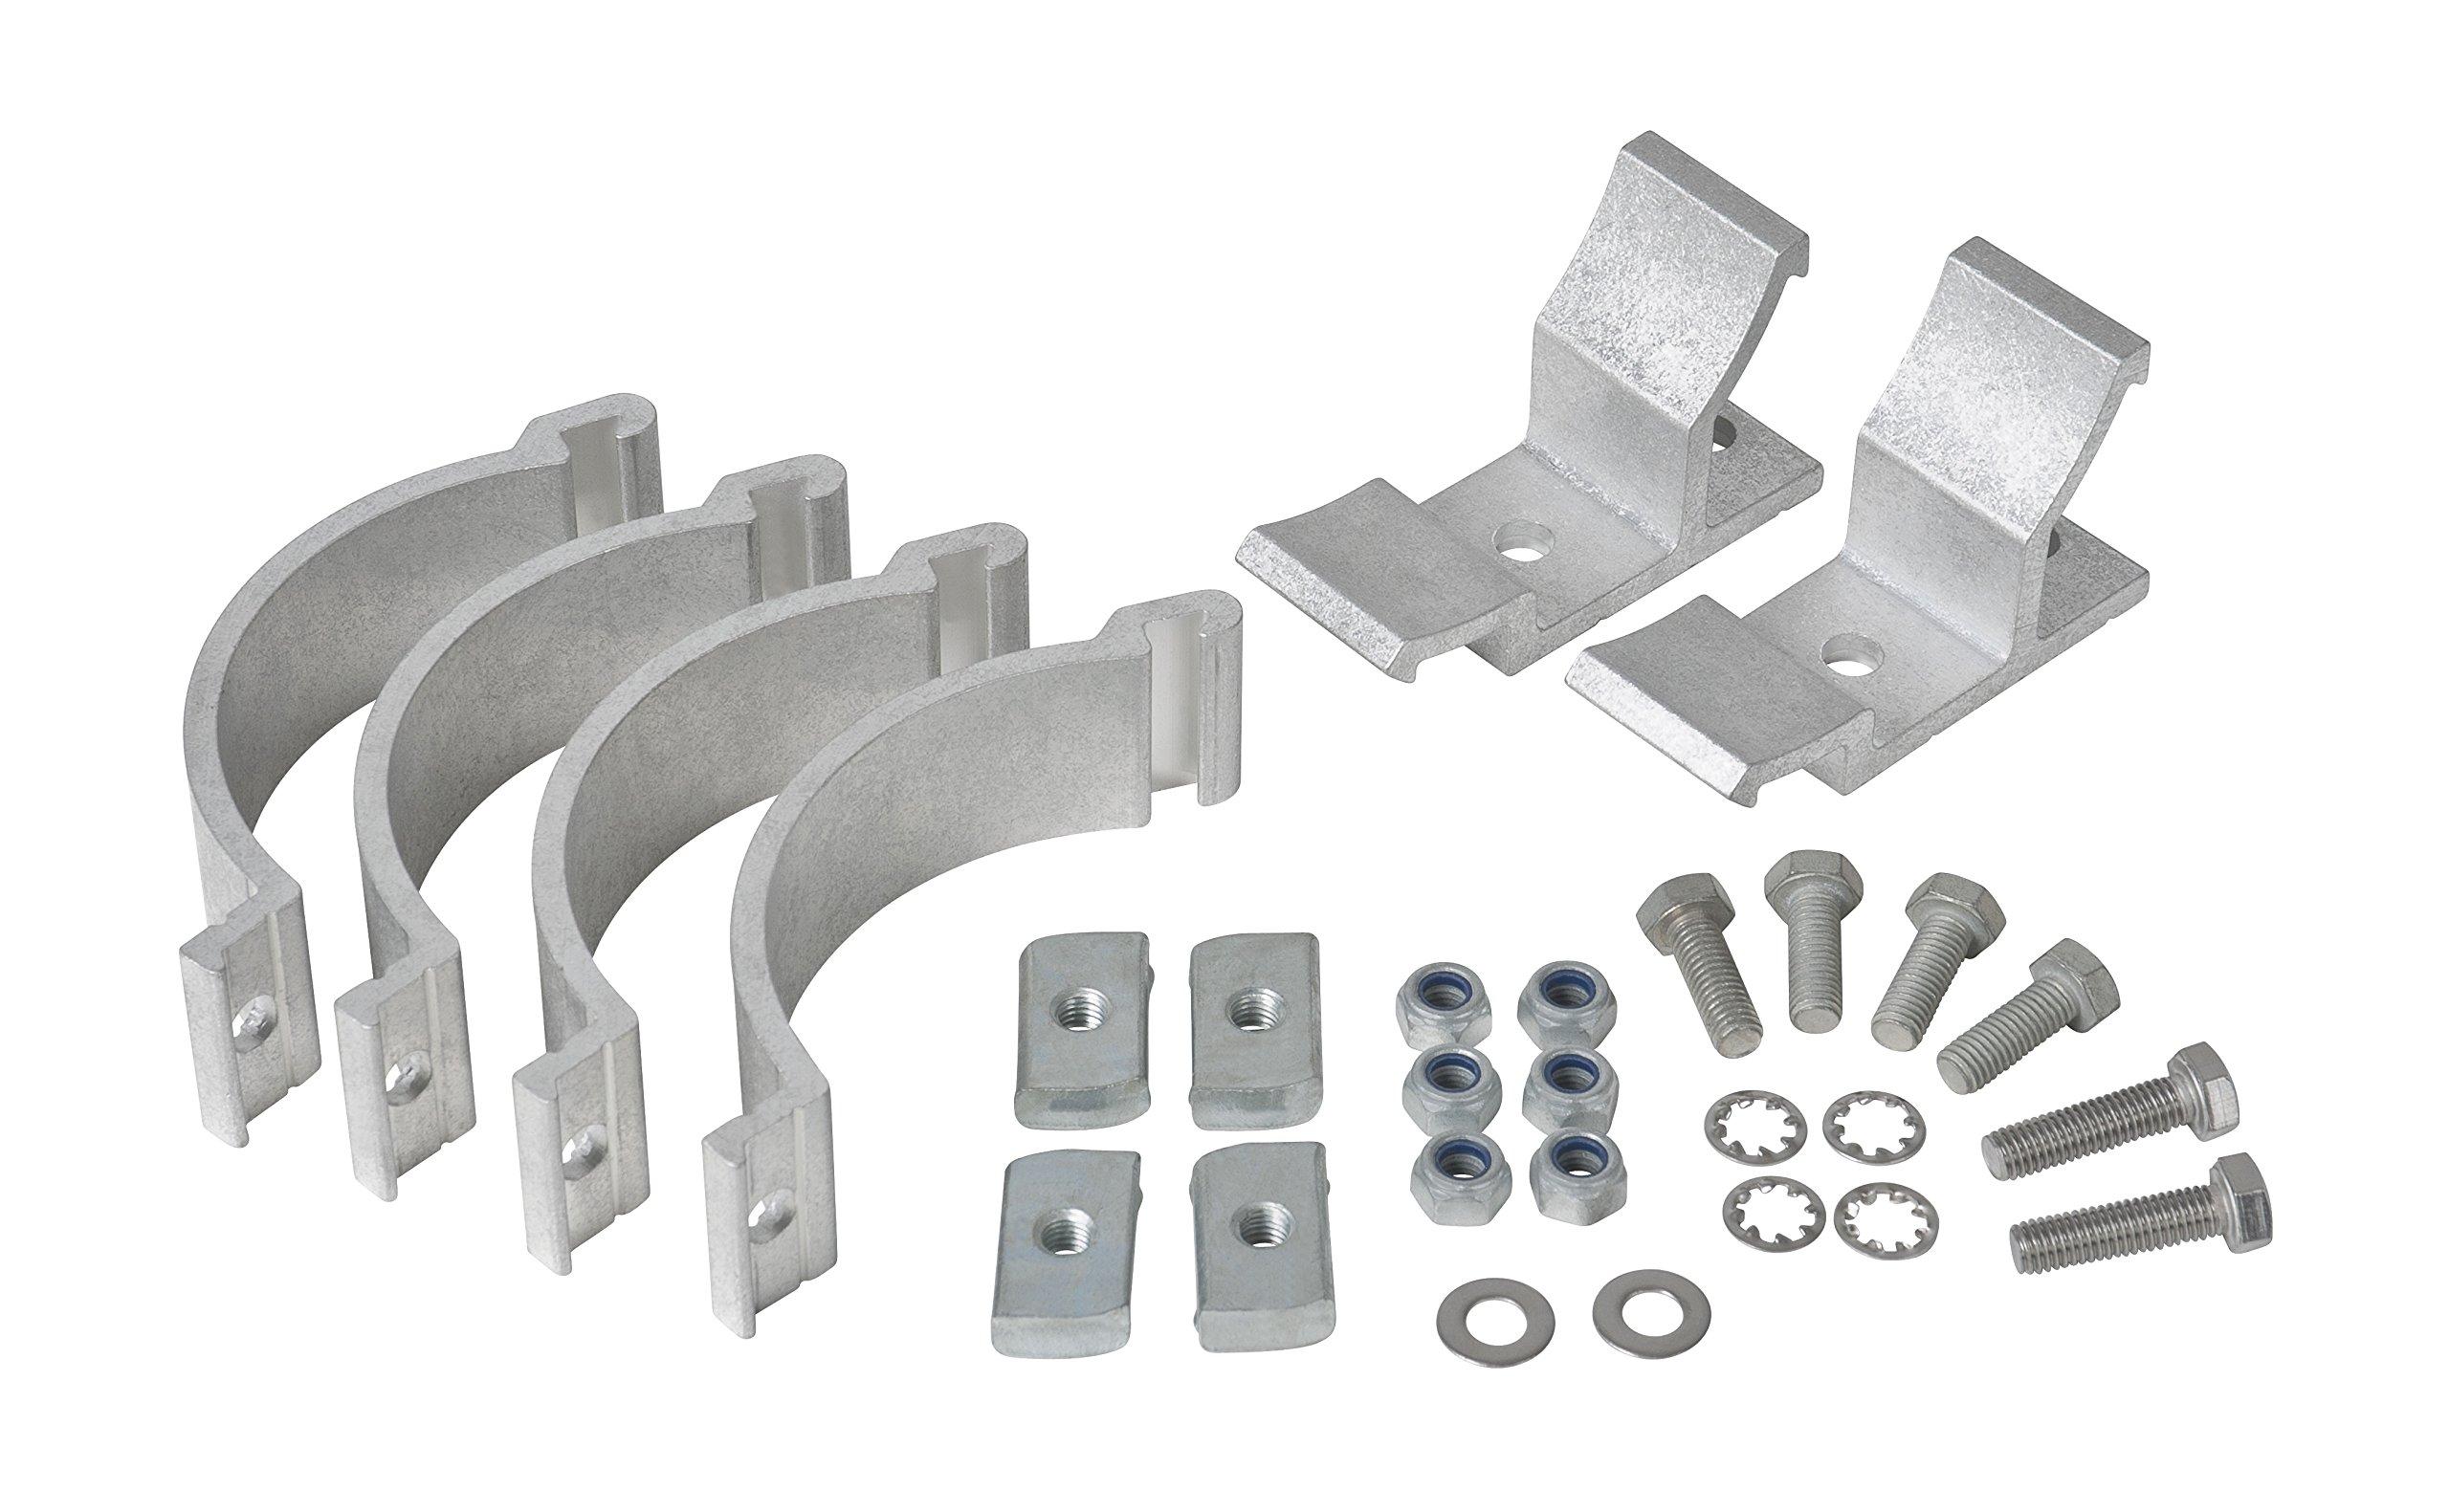 Rhino Rack BC2 Conduit Clamp Set (2 Piece)